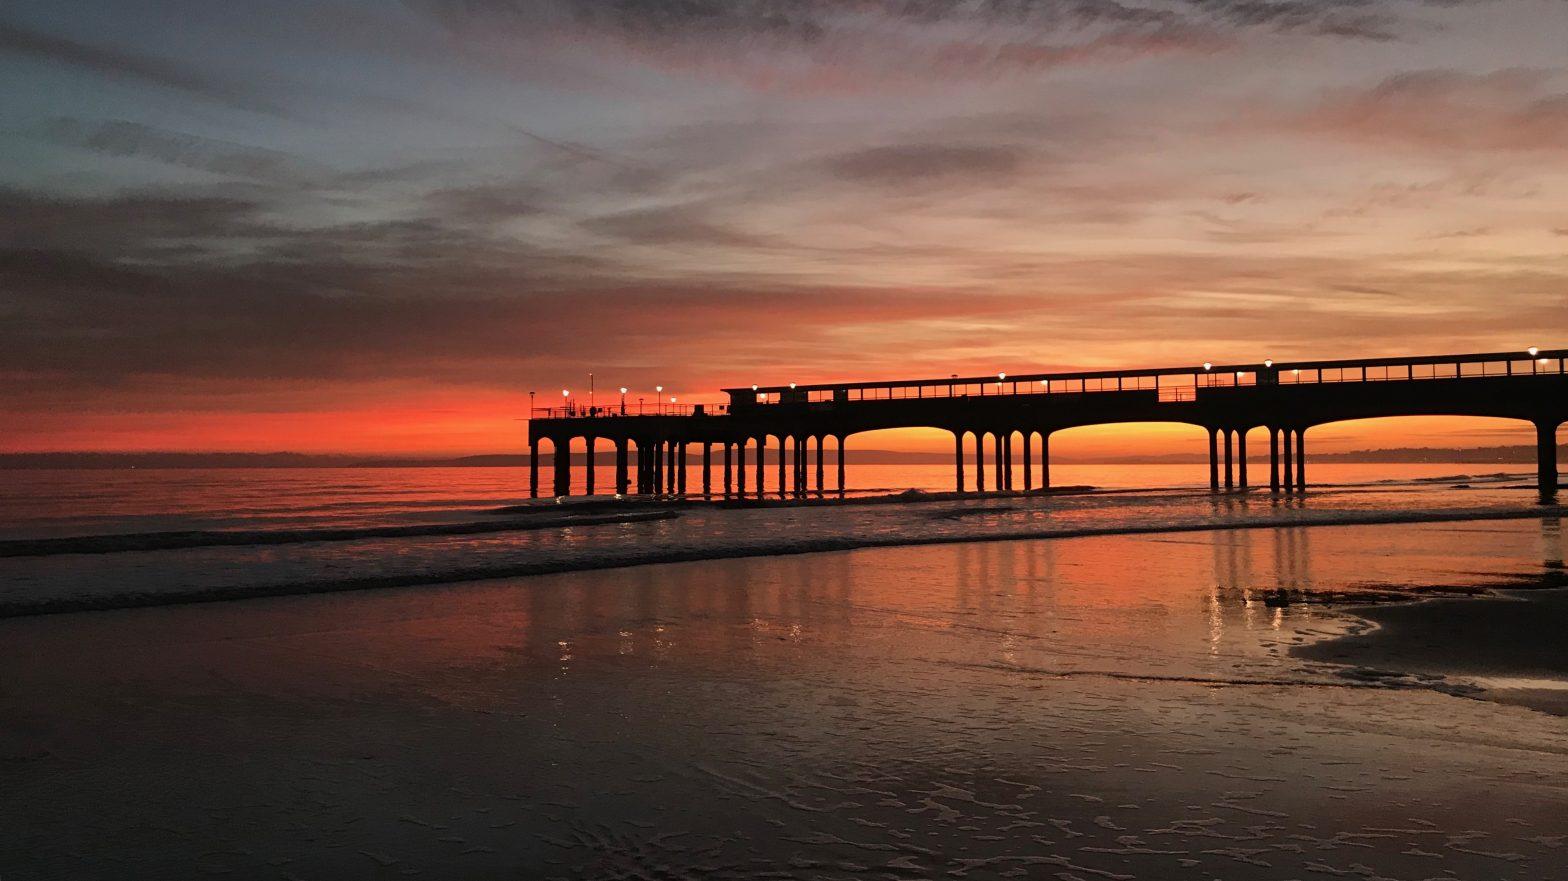 Boscombe pier at sunset